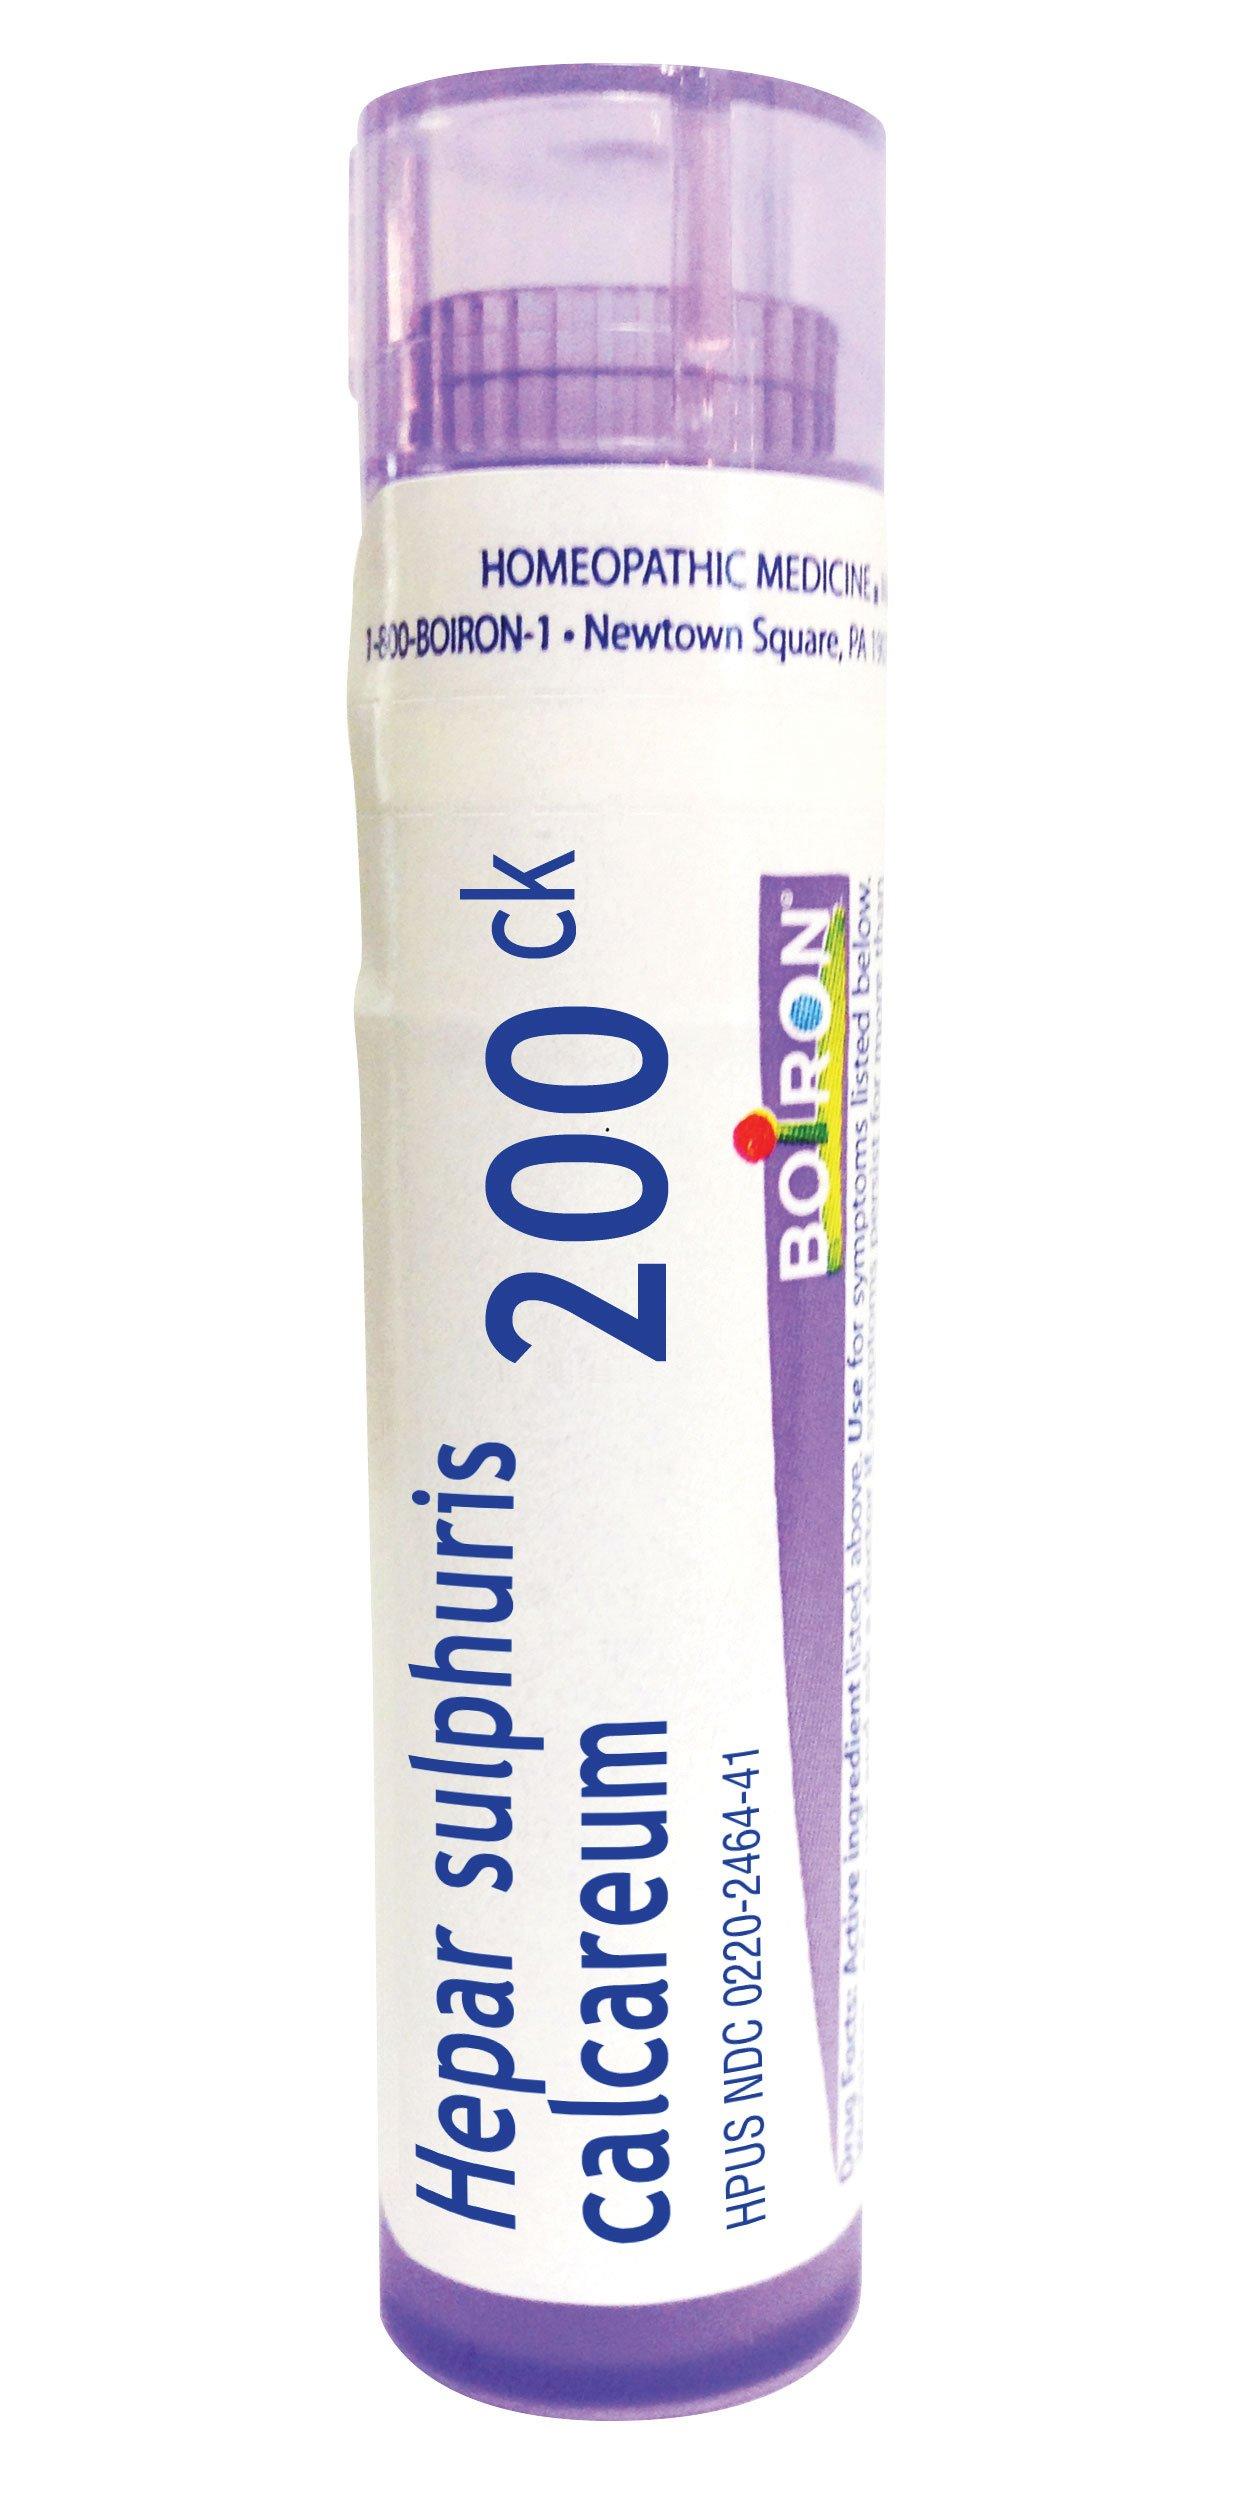 Boiron Hepar Sulphuris Calcareum 200C, 80 Pellets, Homeopathic Medicine for Cough